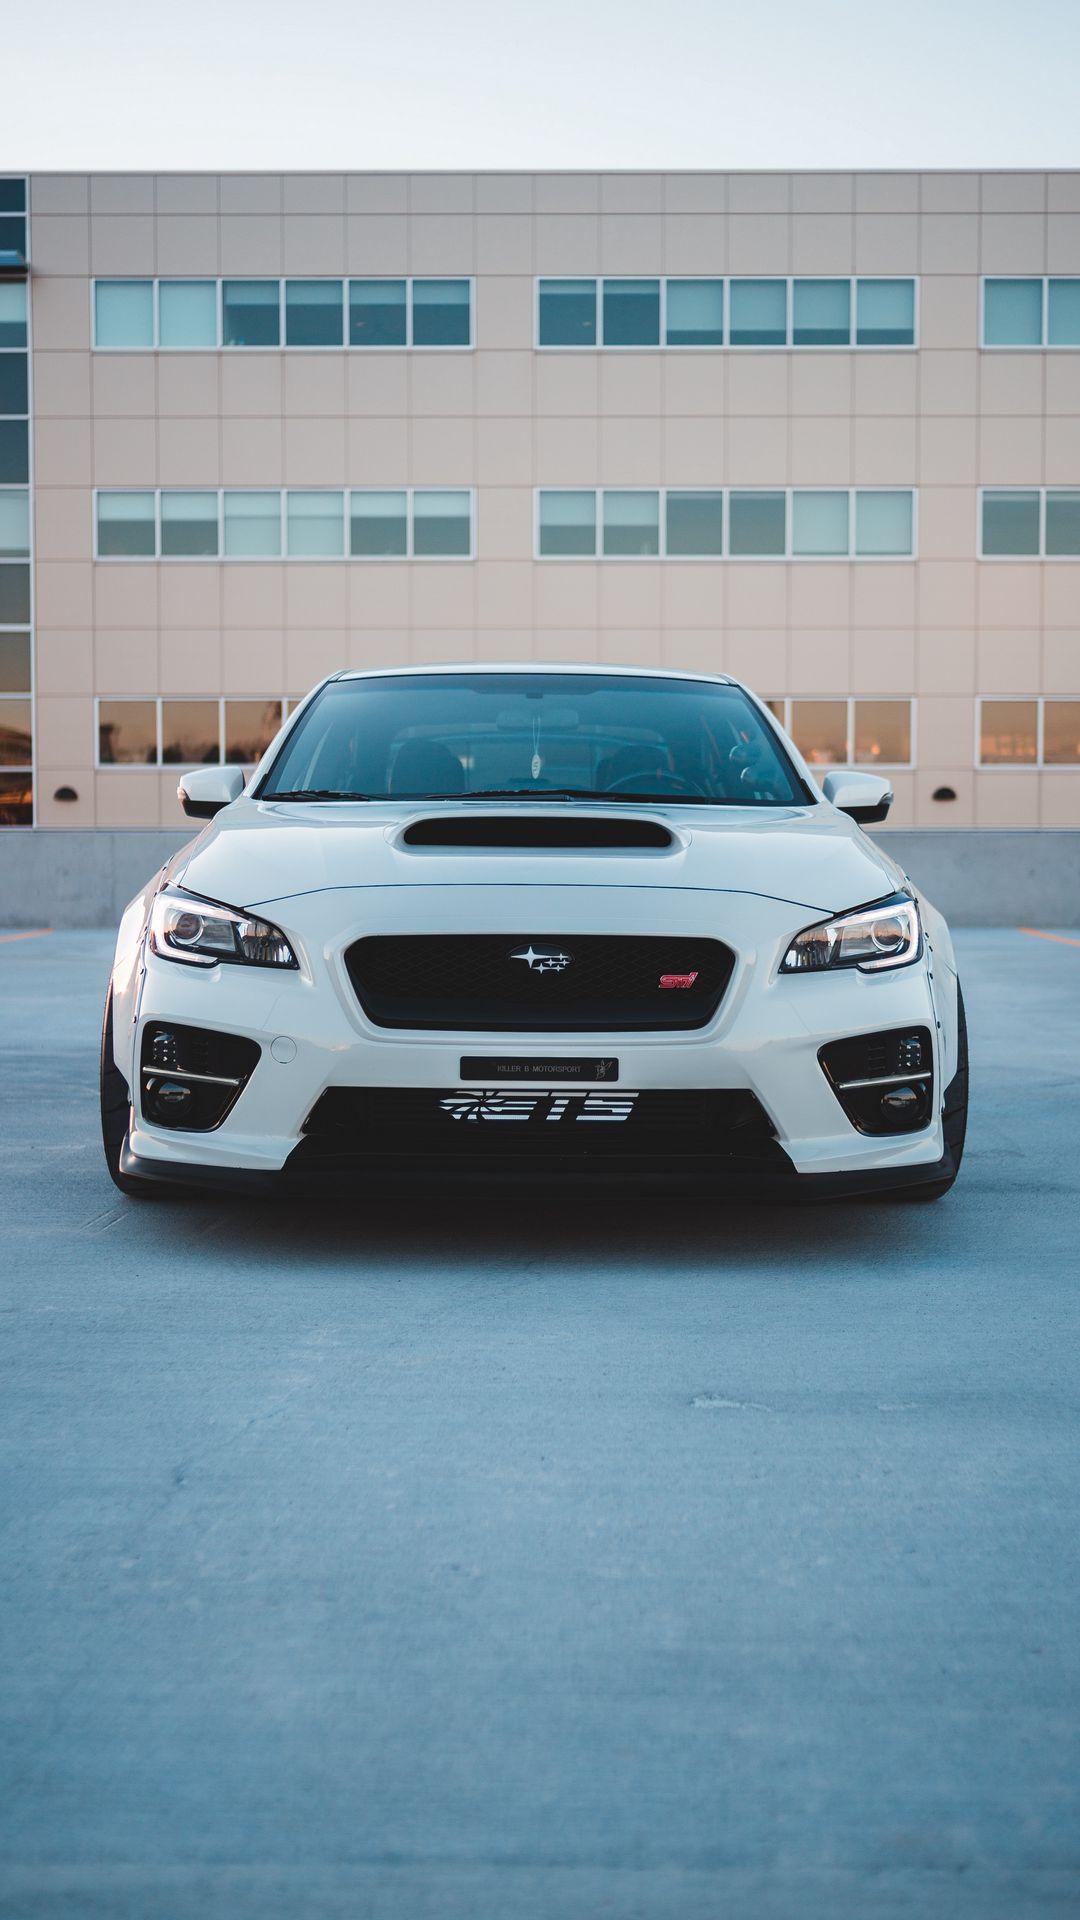 Subaru Modified Car HD Wallpapers Free Download